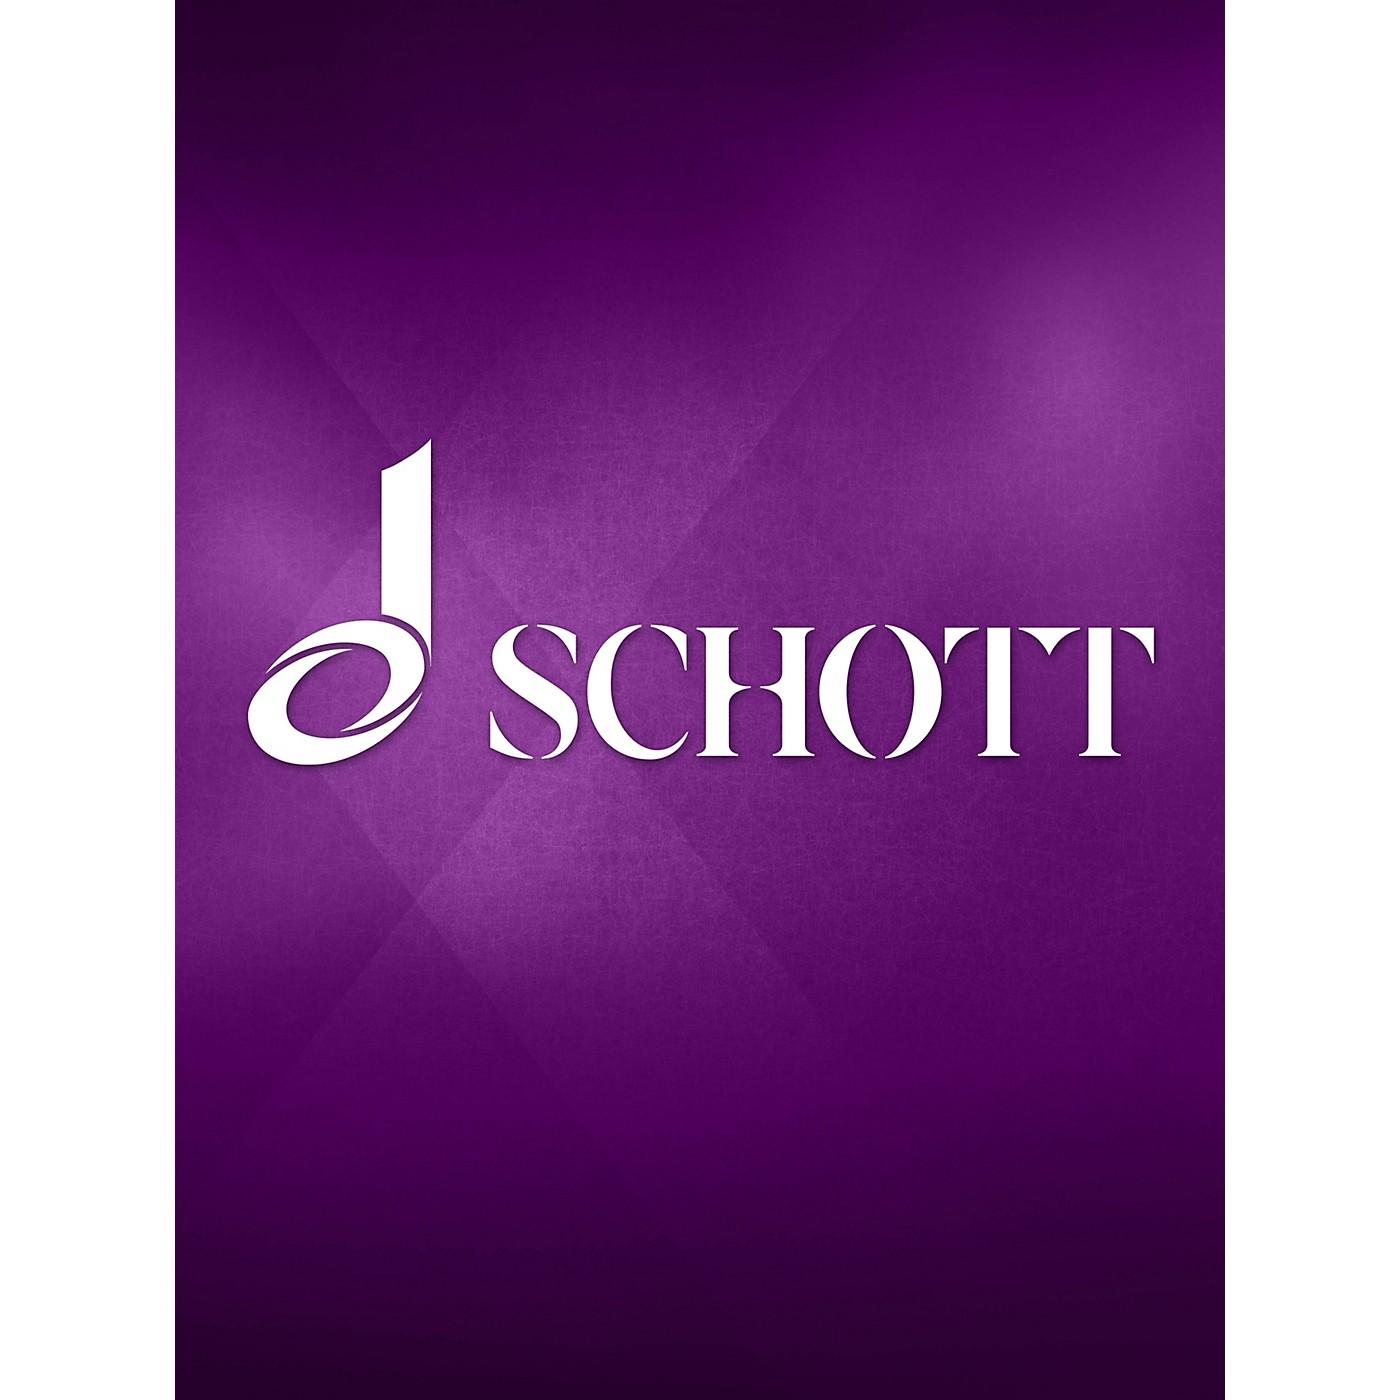 Schott Waltz from Sleeping Beauty, Op. 66, No. 6 (Piano) Schott Series thumbnail